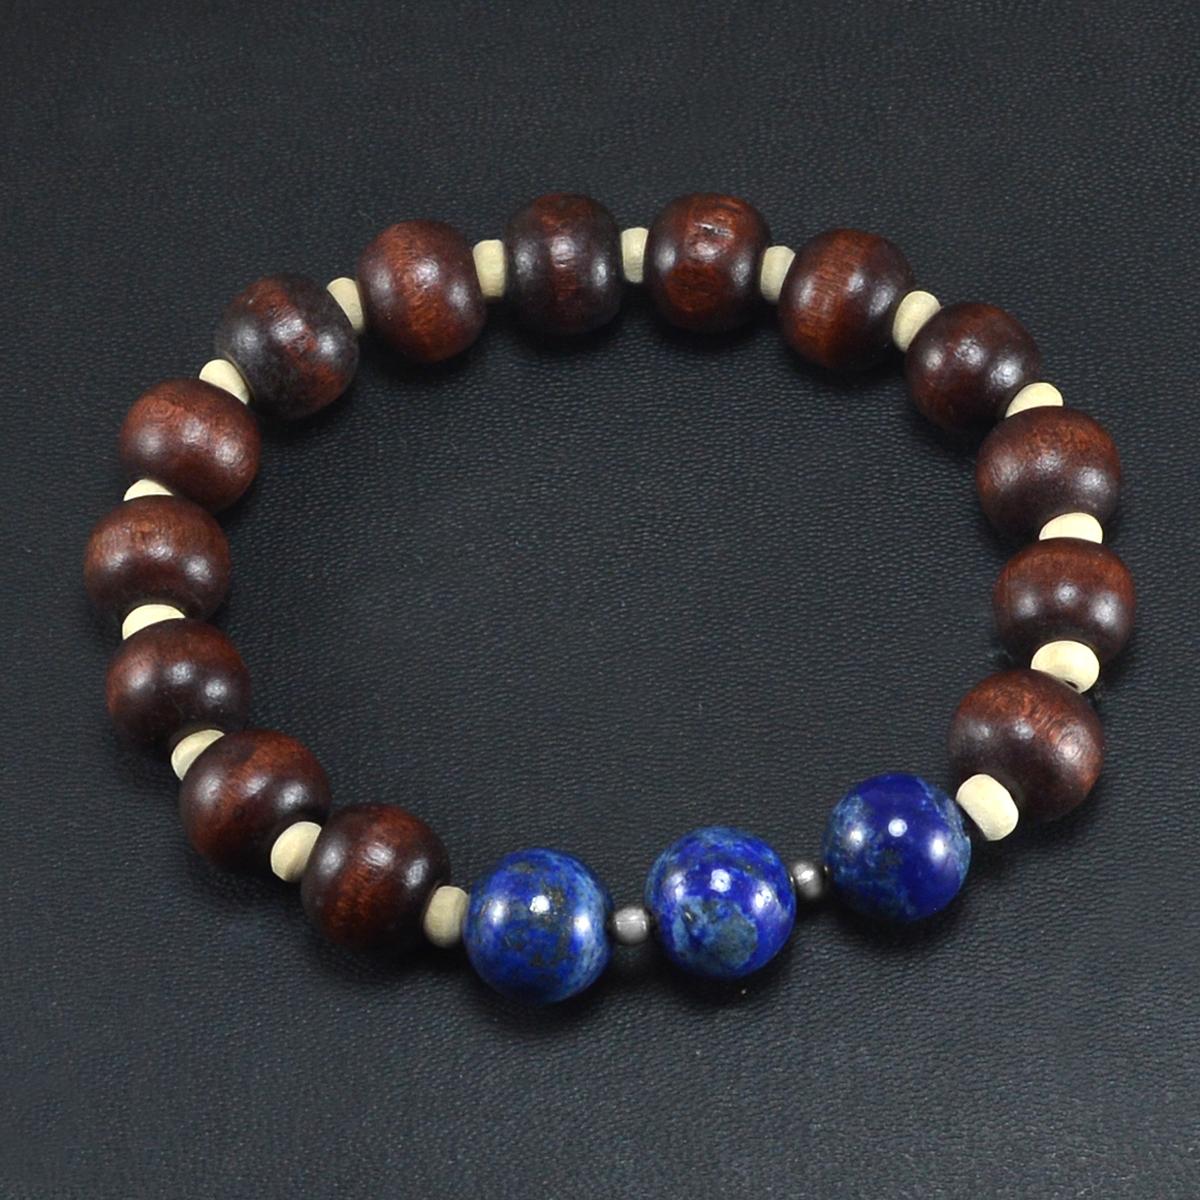 Beautiful Beaded Lapis Lazuli And Handmade Manufacturer Wood Stretch Bracelet, 925 Silver Bracelet Jaipur Rajasthan India